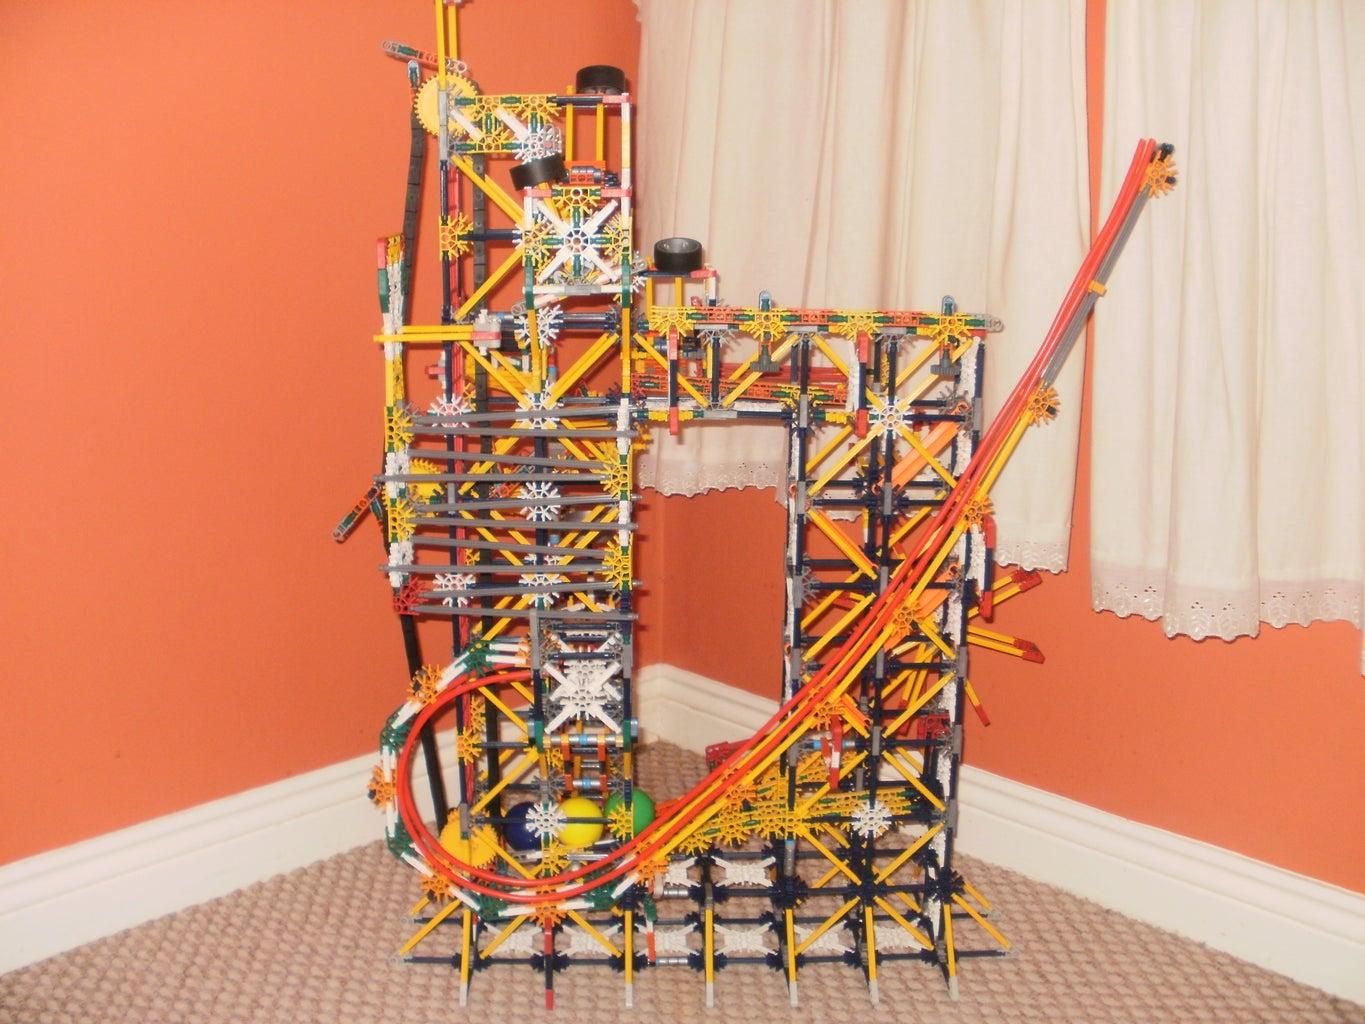 Knex Ball Machine - Project Ballatron.